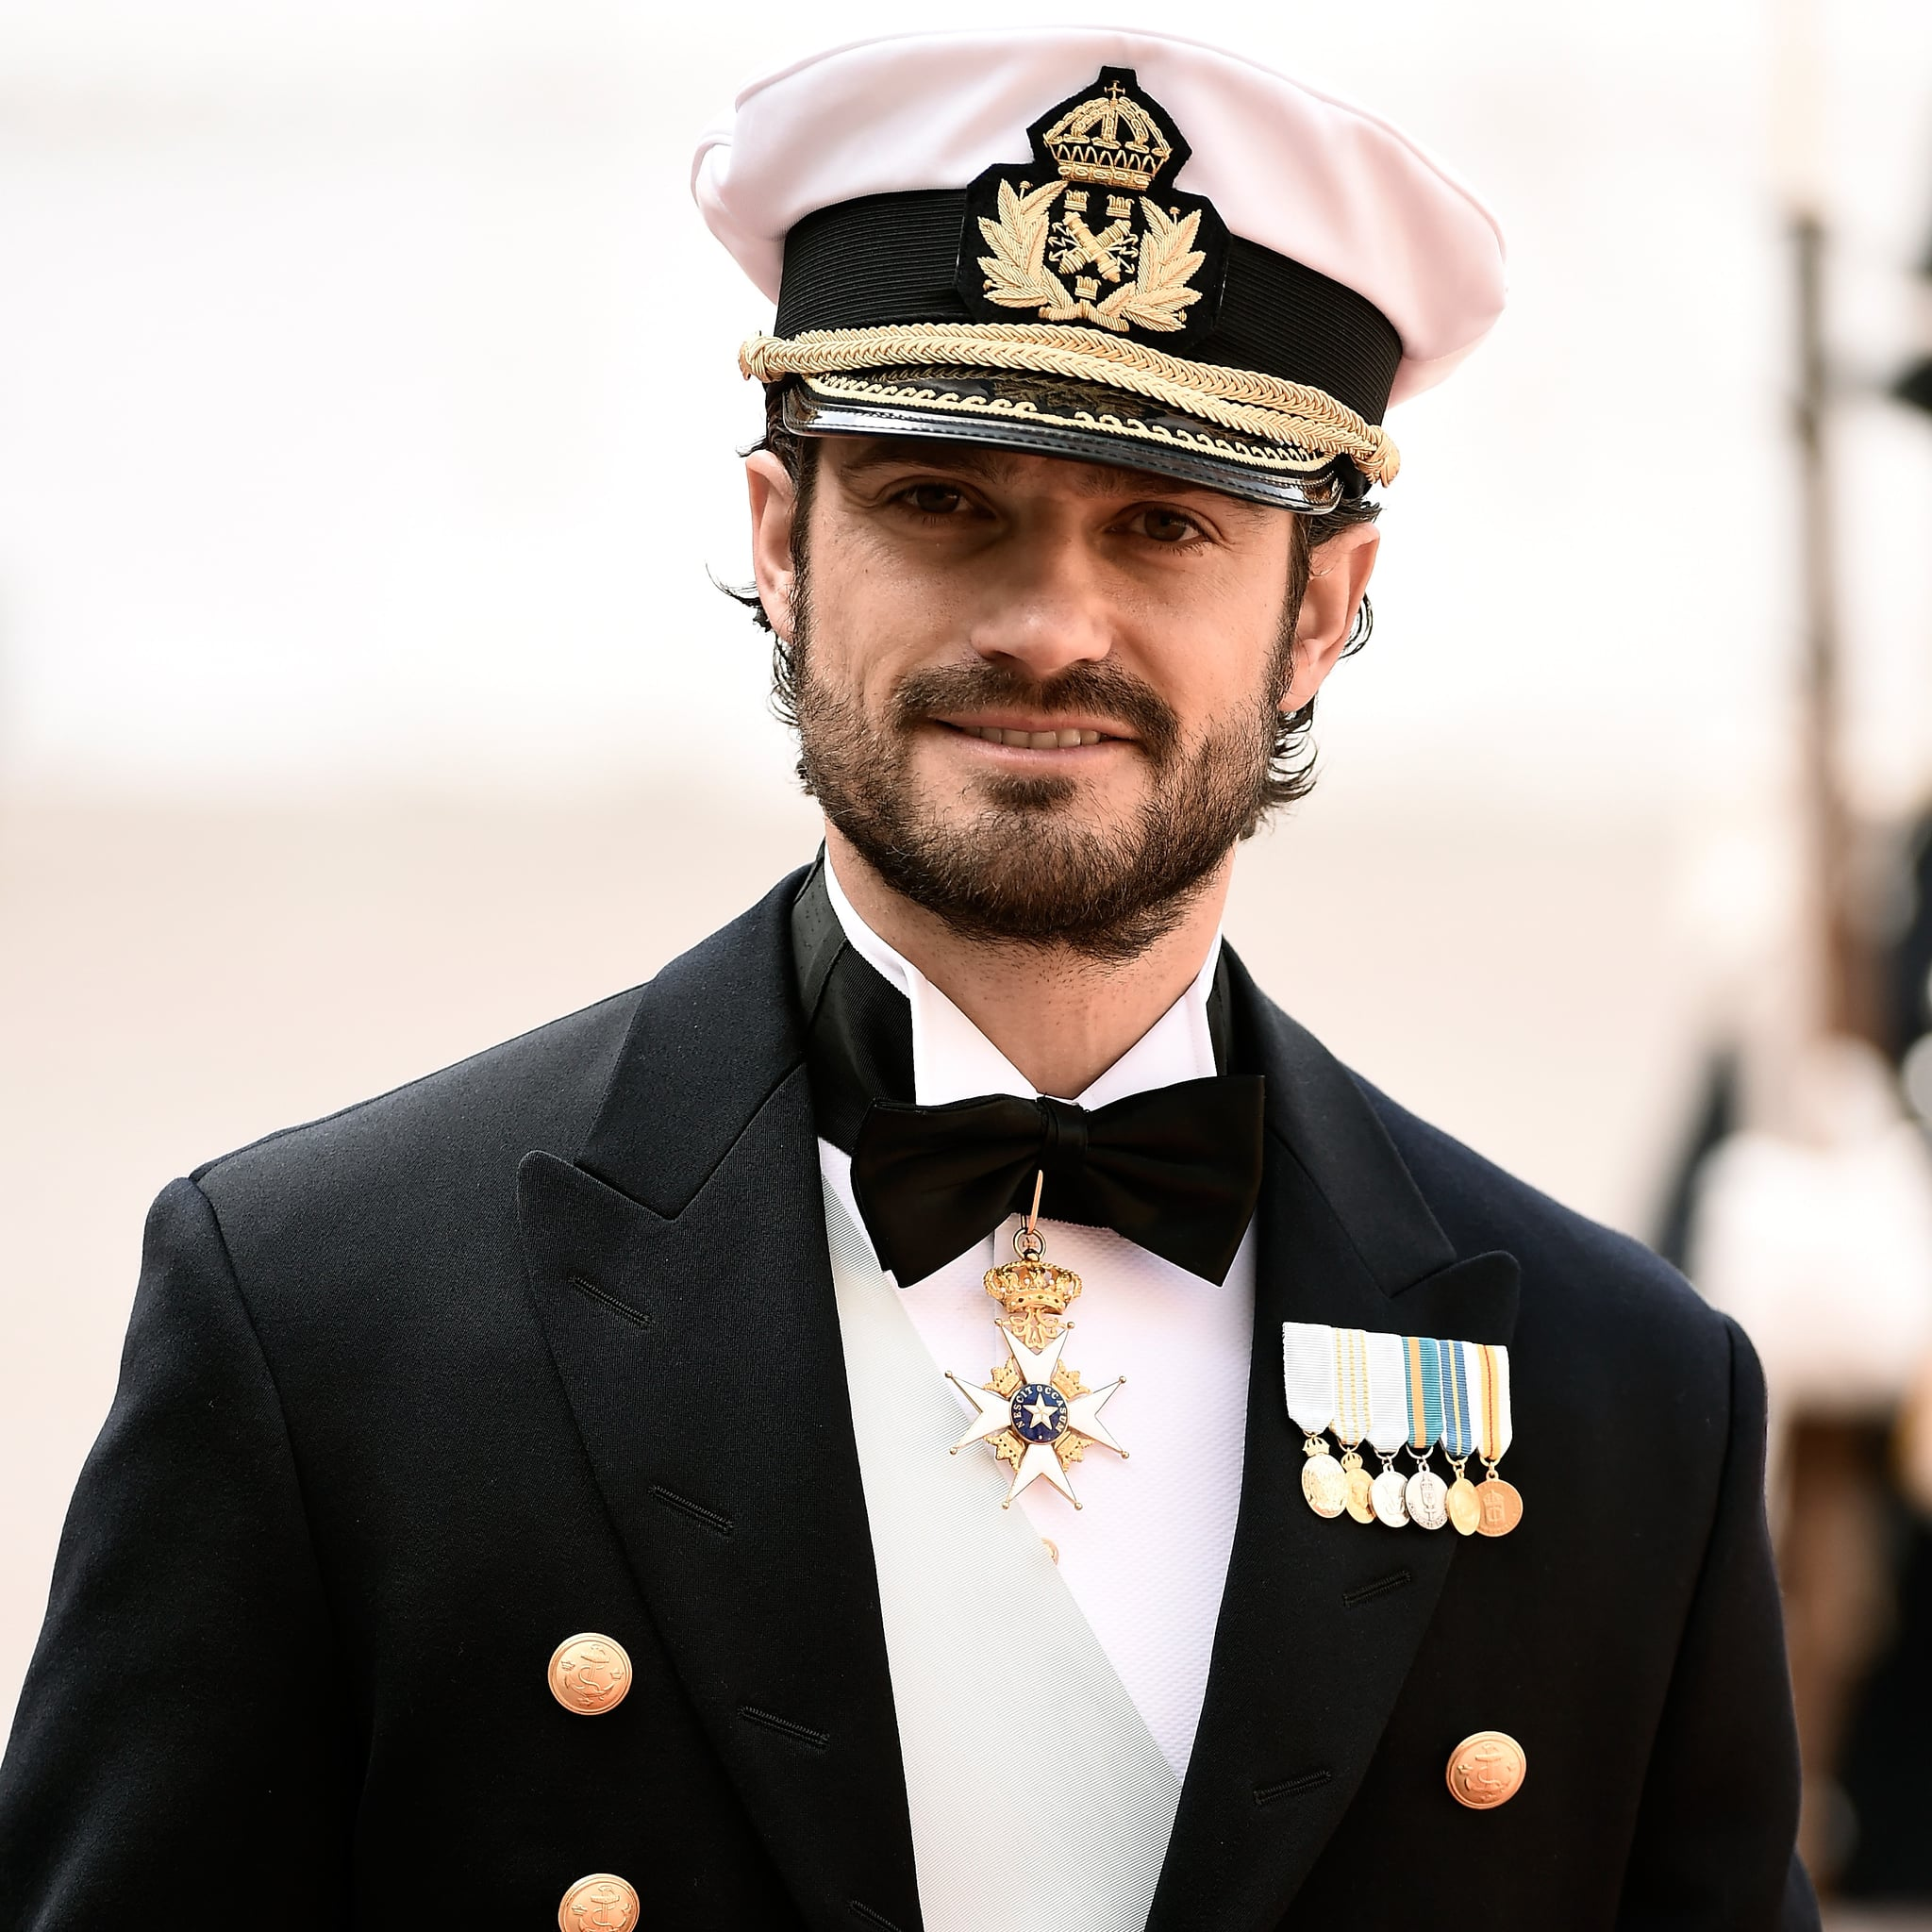 Prince Carl Philip and Prince Harry Hotness Poll | POPSUGAR Celebrity UK